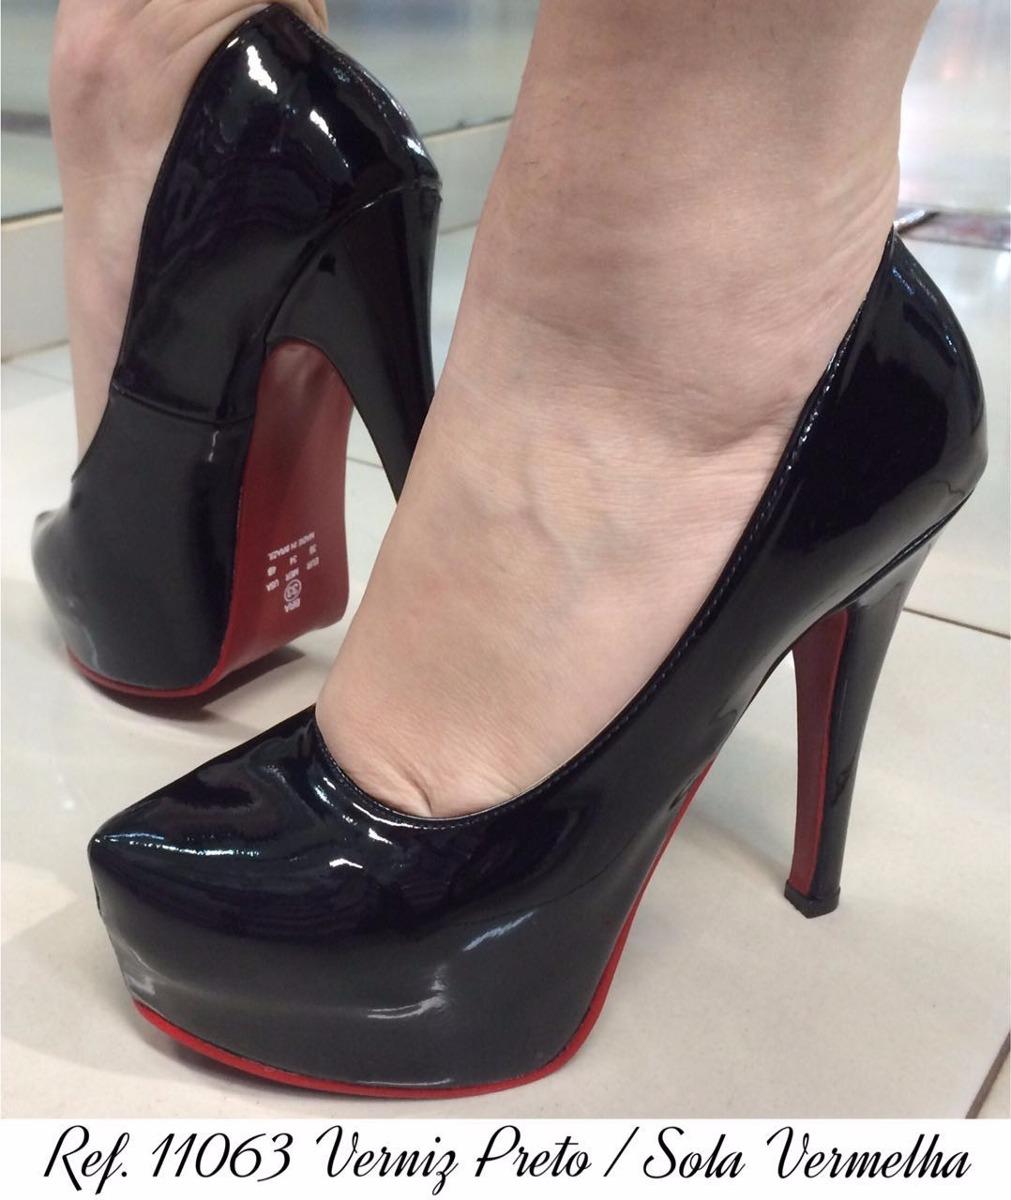 acf505f067 scarpin preto verniz meia pata salto alto fino sola vermelha. Carregando  zoom.